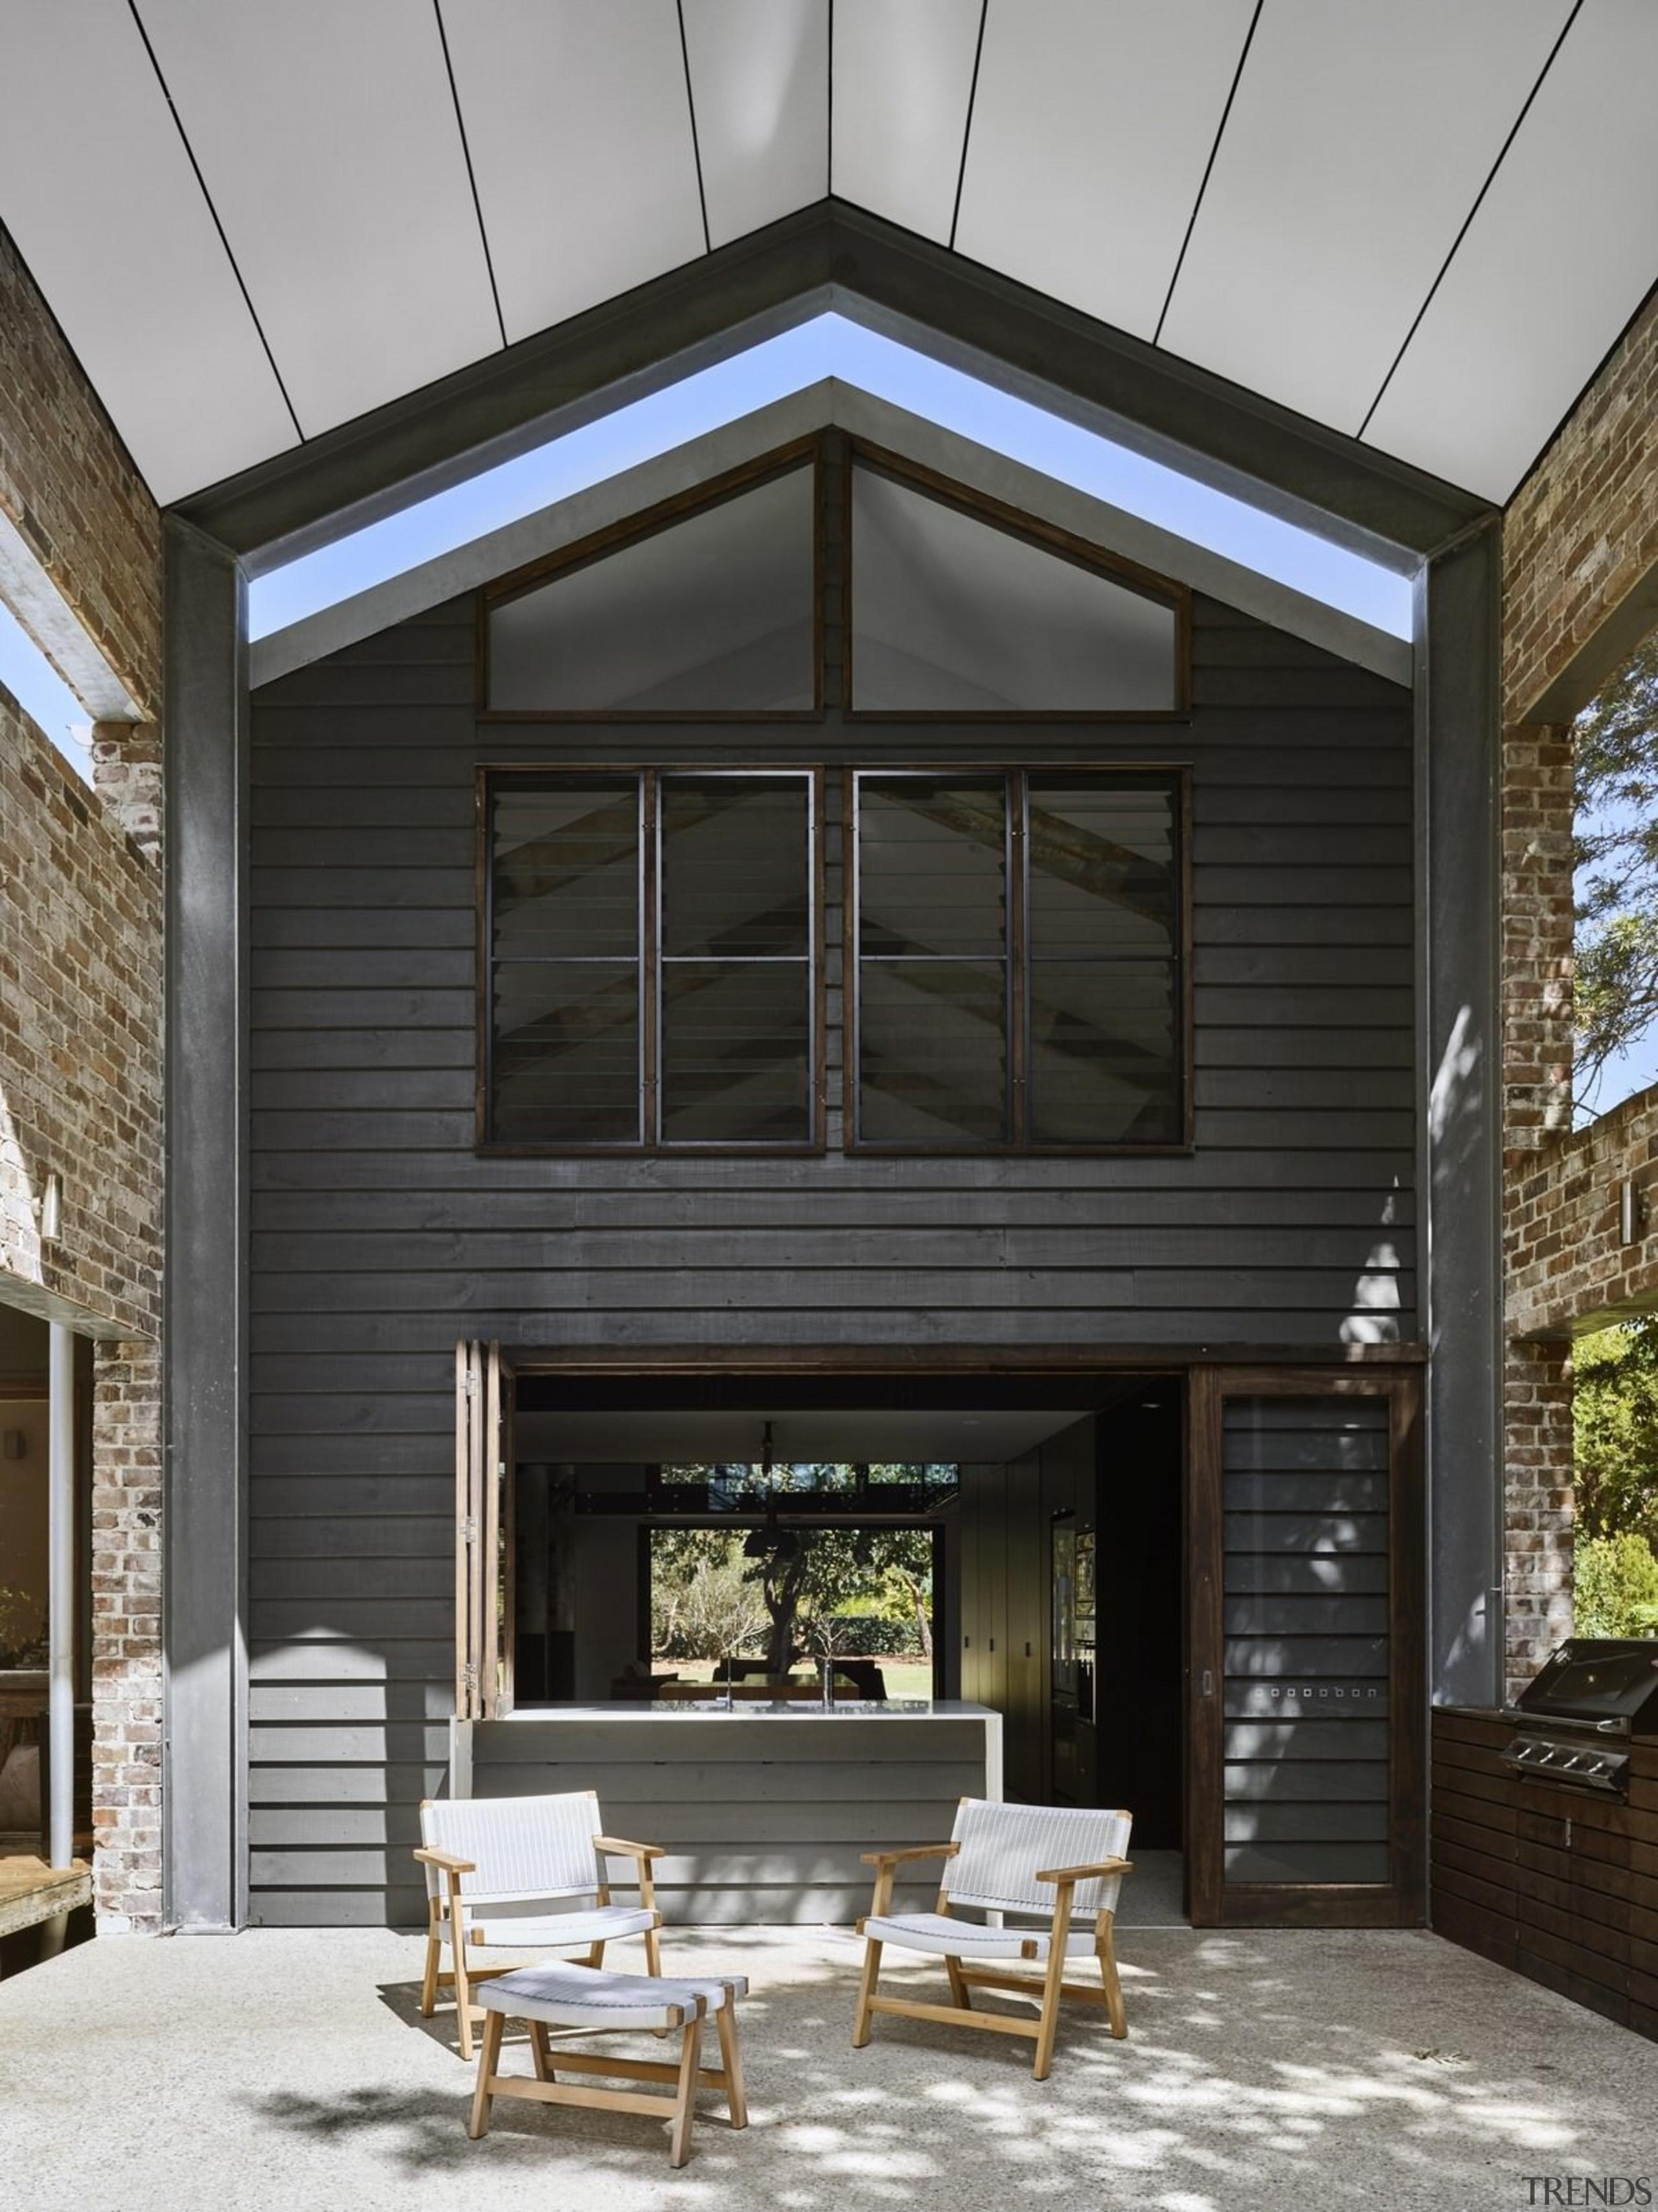 A view of the outdoor room - A facade, home, house, interior design, residential area, siding, window, black, gray